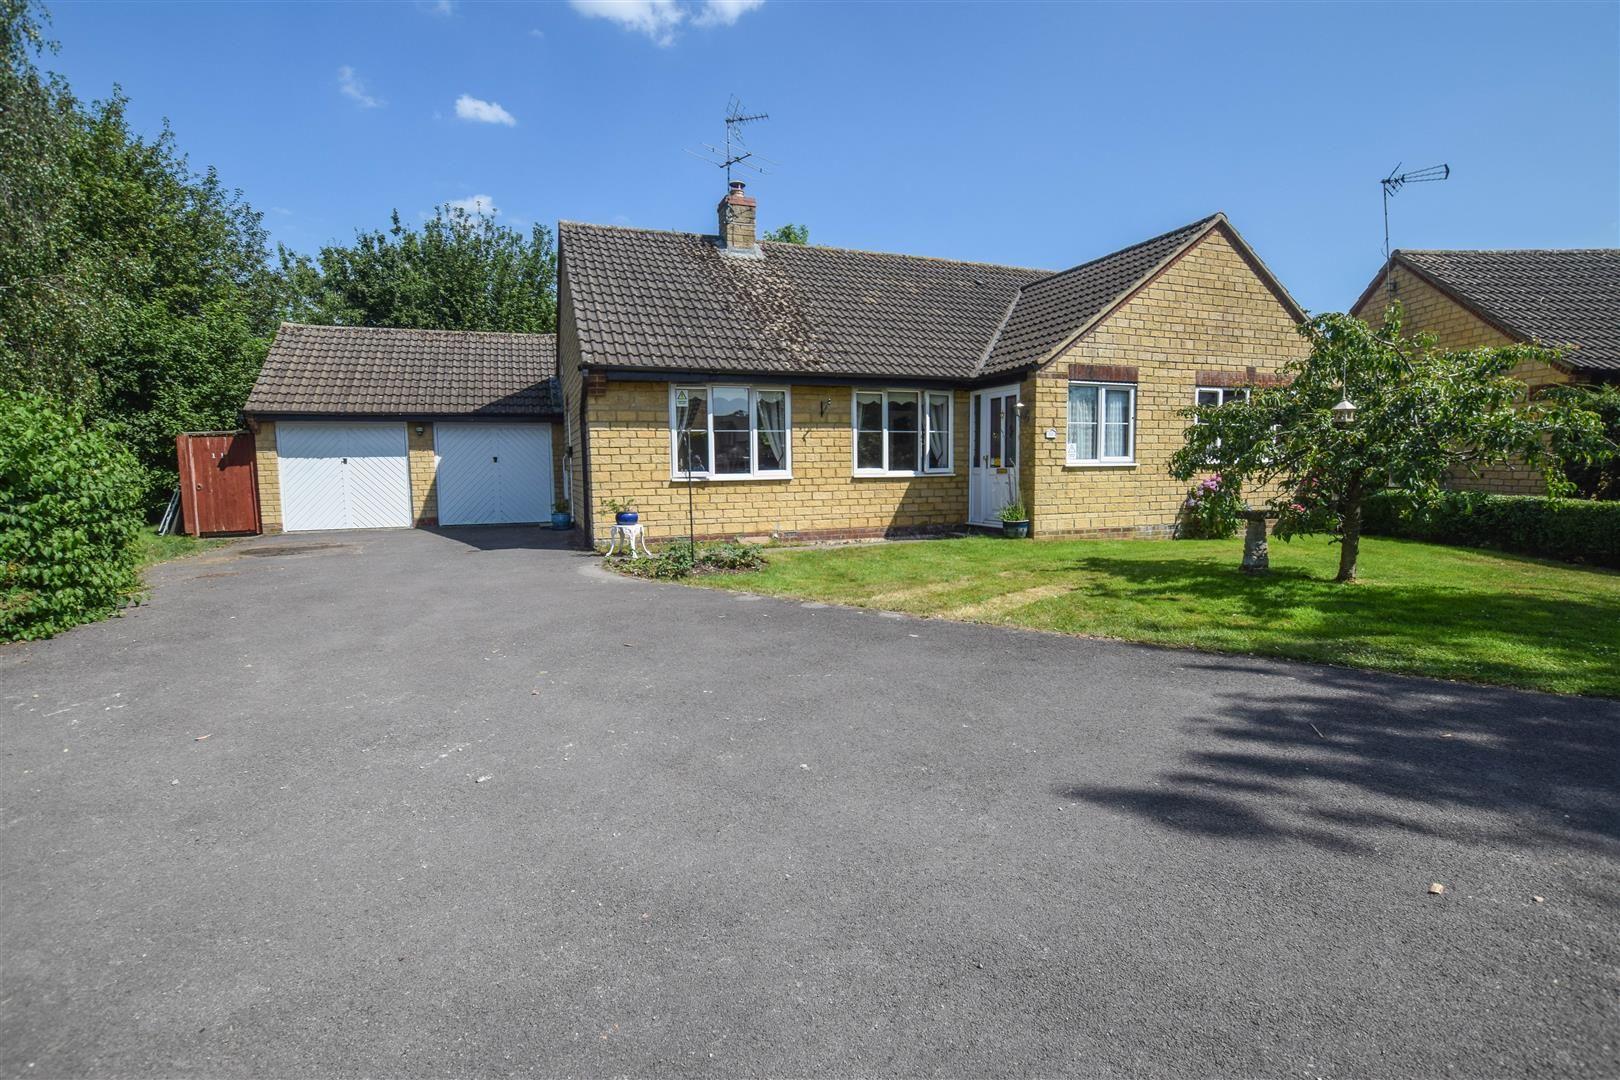 Property photo 1 of 10. Dsc_0068.Jpg